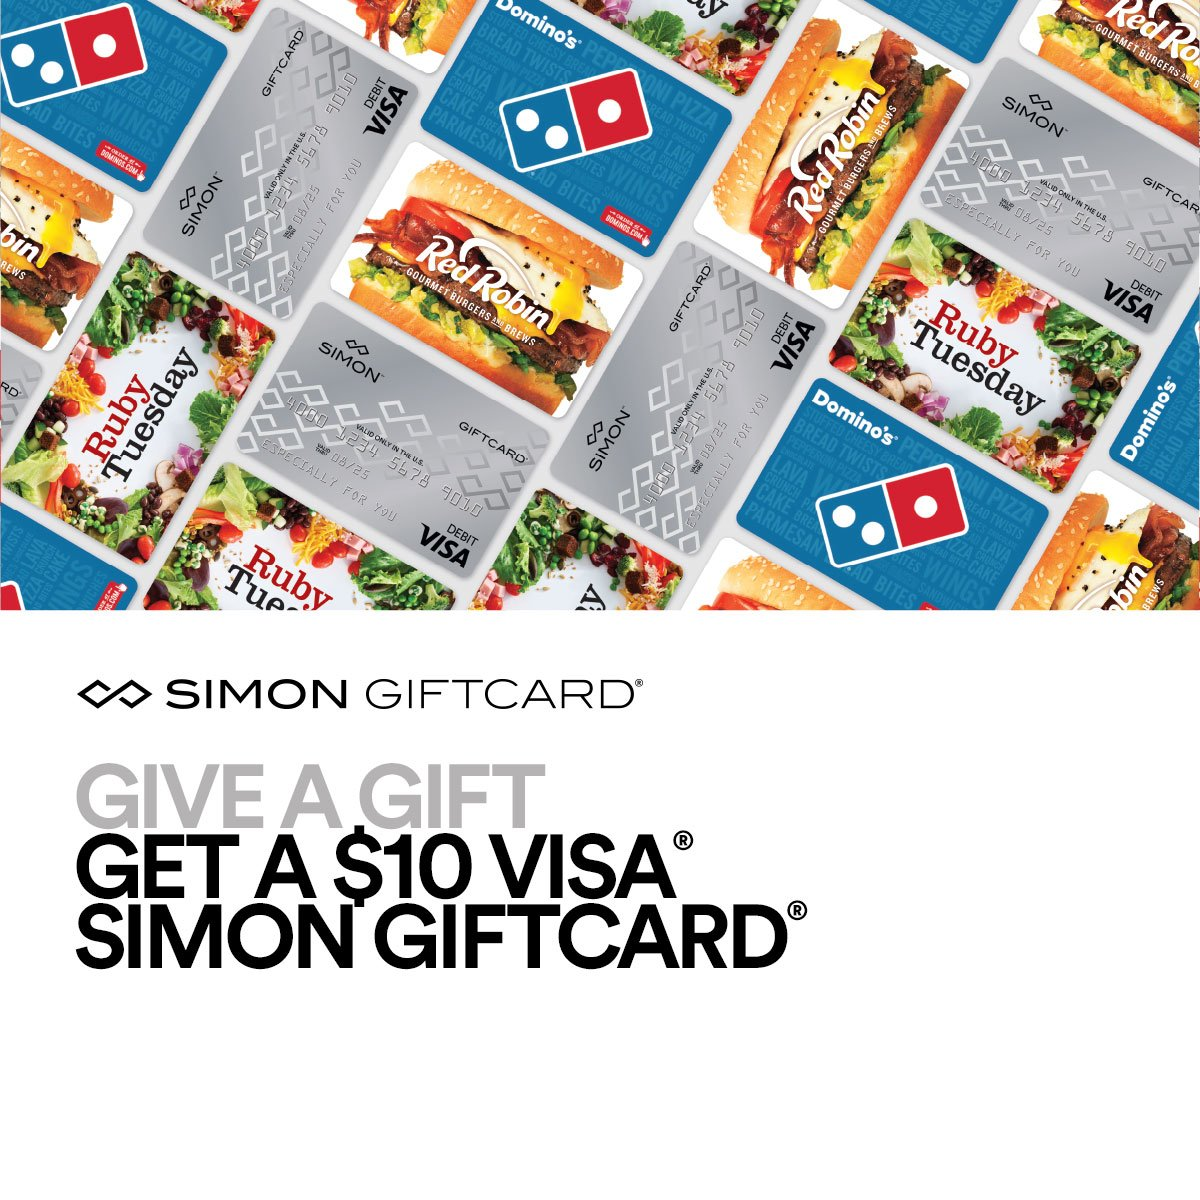 d01c3b1ced4a0 ... at Simon Guest Services October 22–November 4